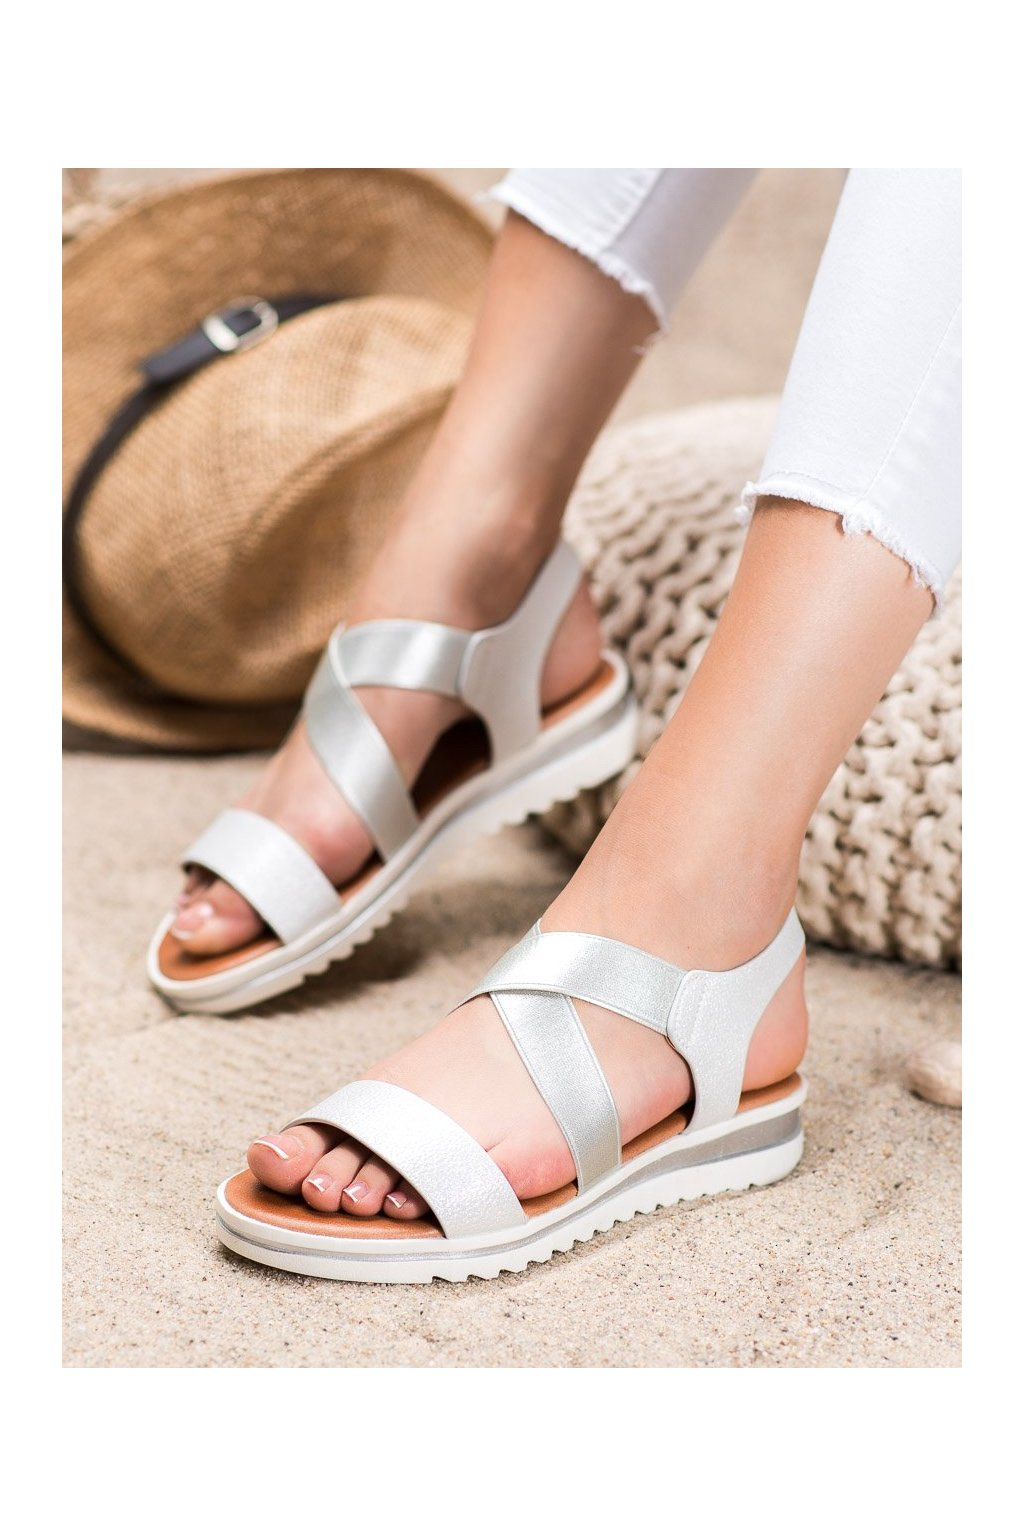 Biele sandále Weide kod Y658W